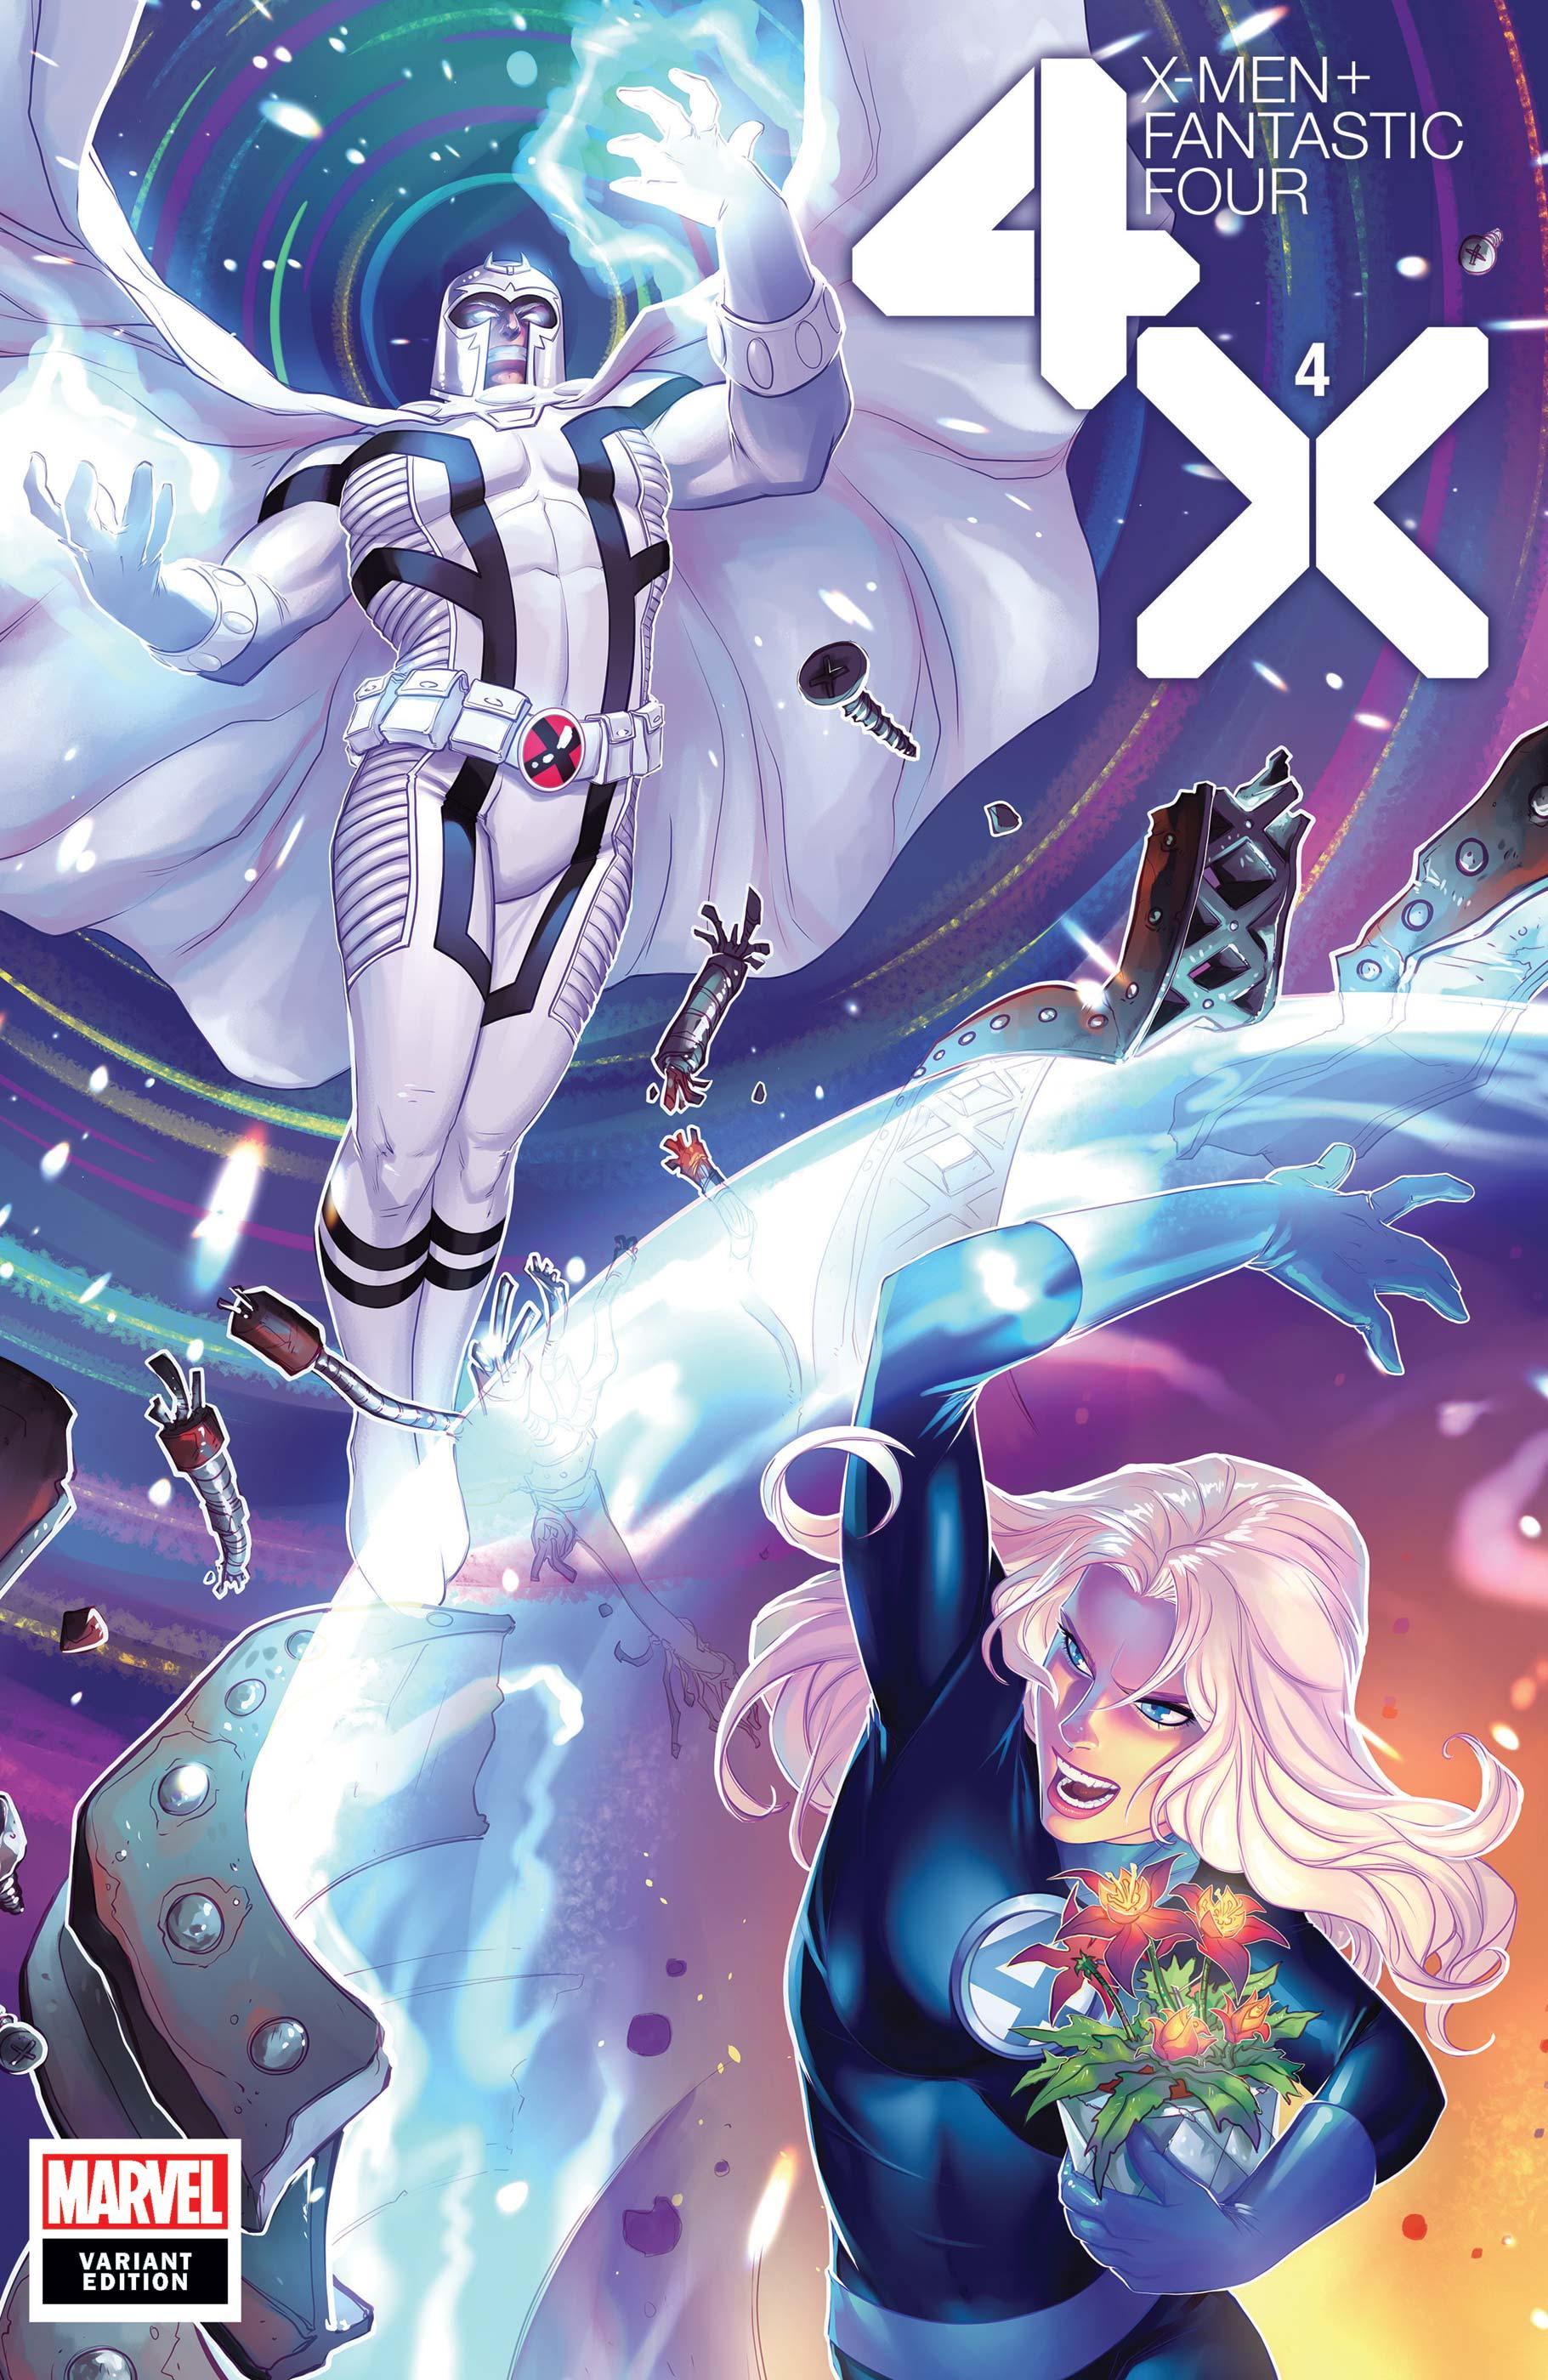 X-Men/Fantastic Four (2020) #4 (Variant)